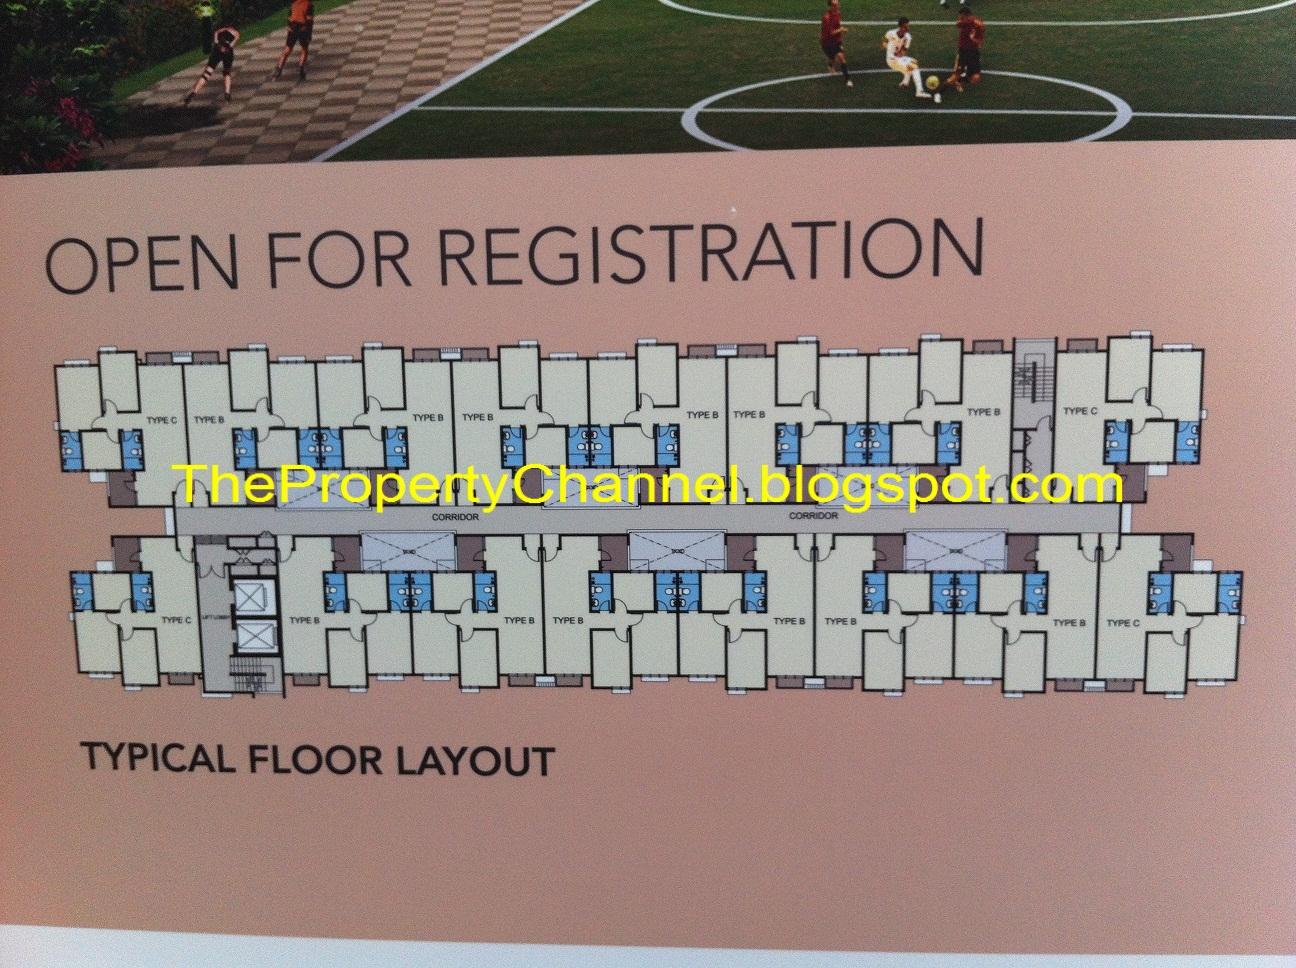 Seri Jati Baiduri Setia Alam The Property Channel Laptop Stand Floor Plan